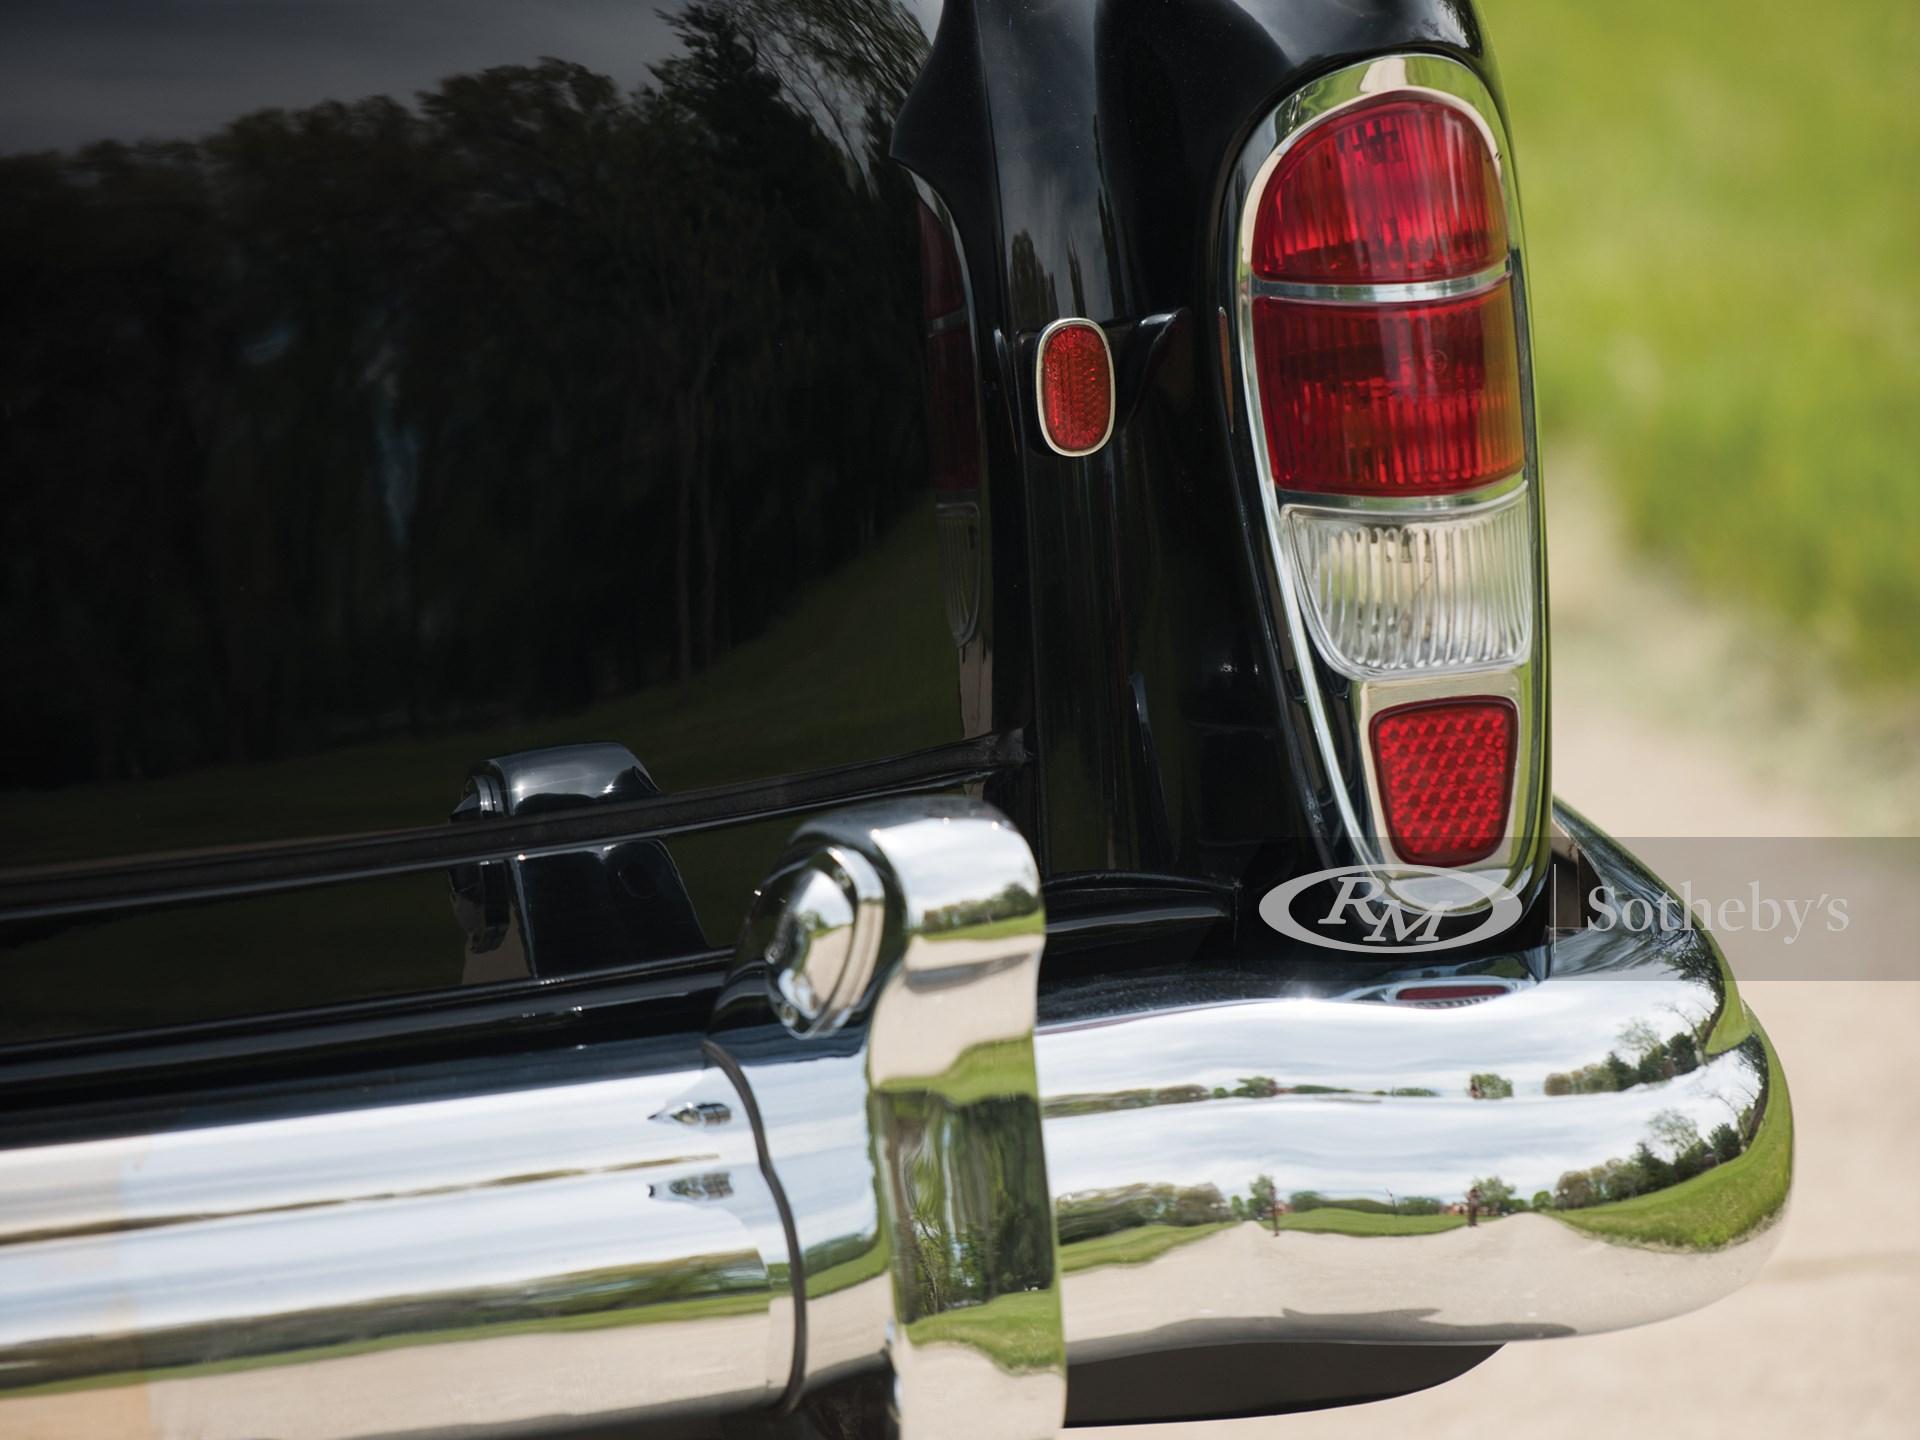 1962 Mercedes-Benz 300 d 'Adenauer' Sedan  -